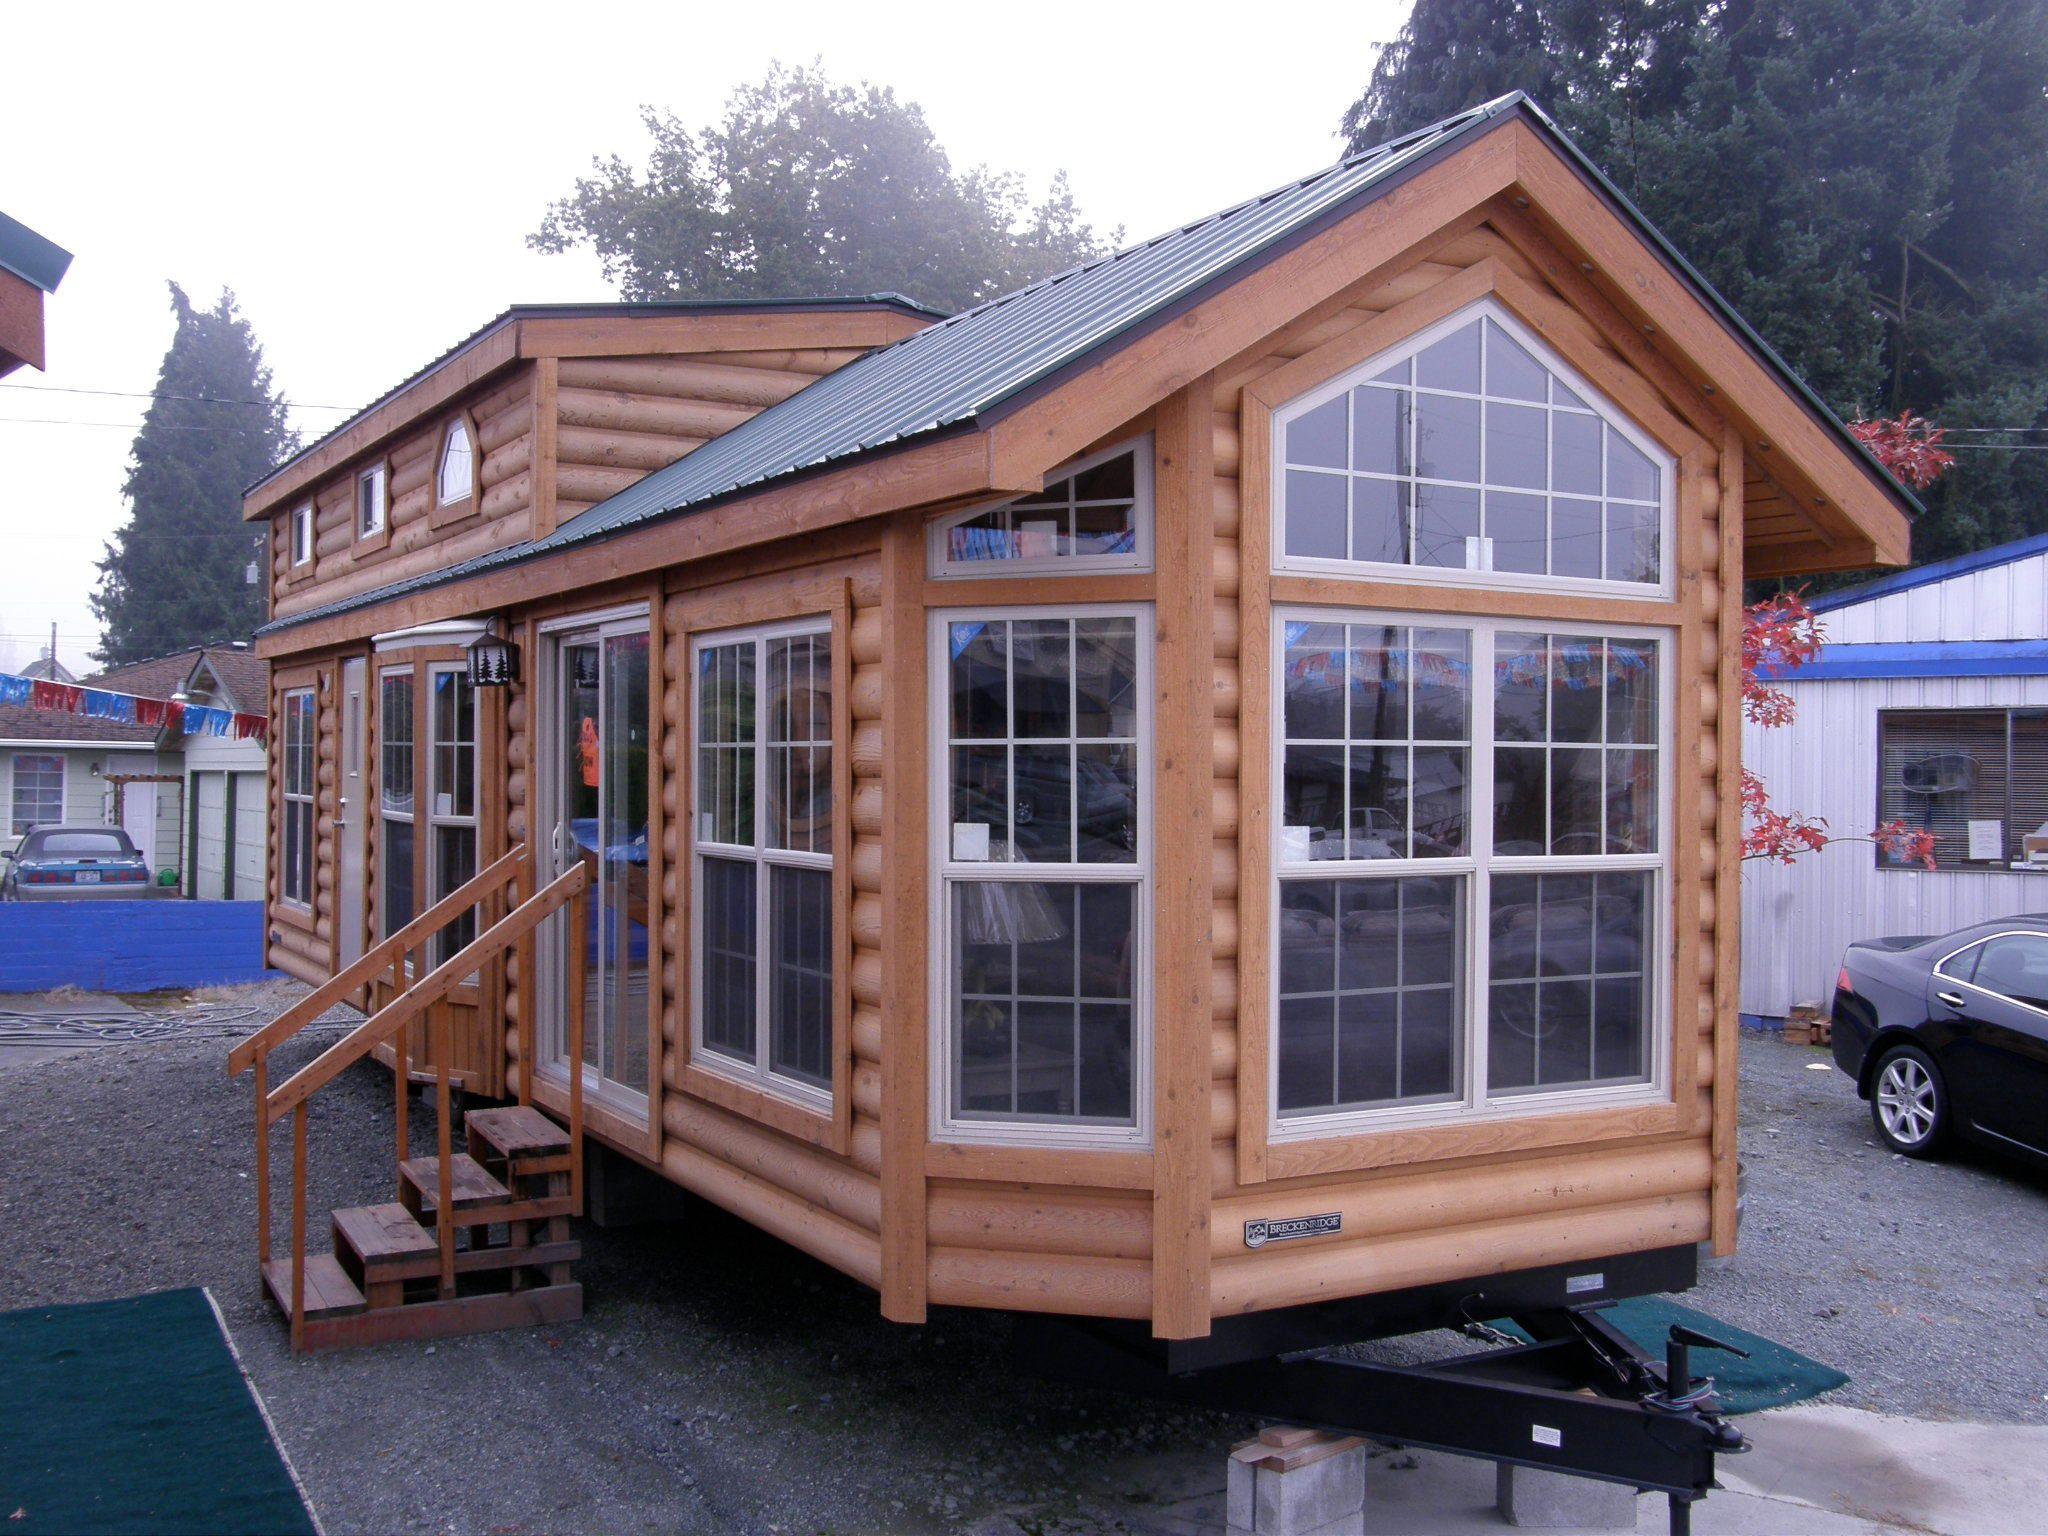 Tiny Home Designs: Photos - Tiny House (Seattle, WA)